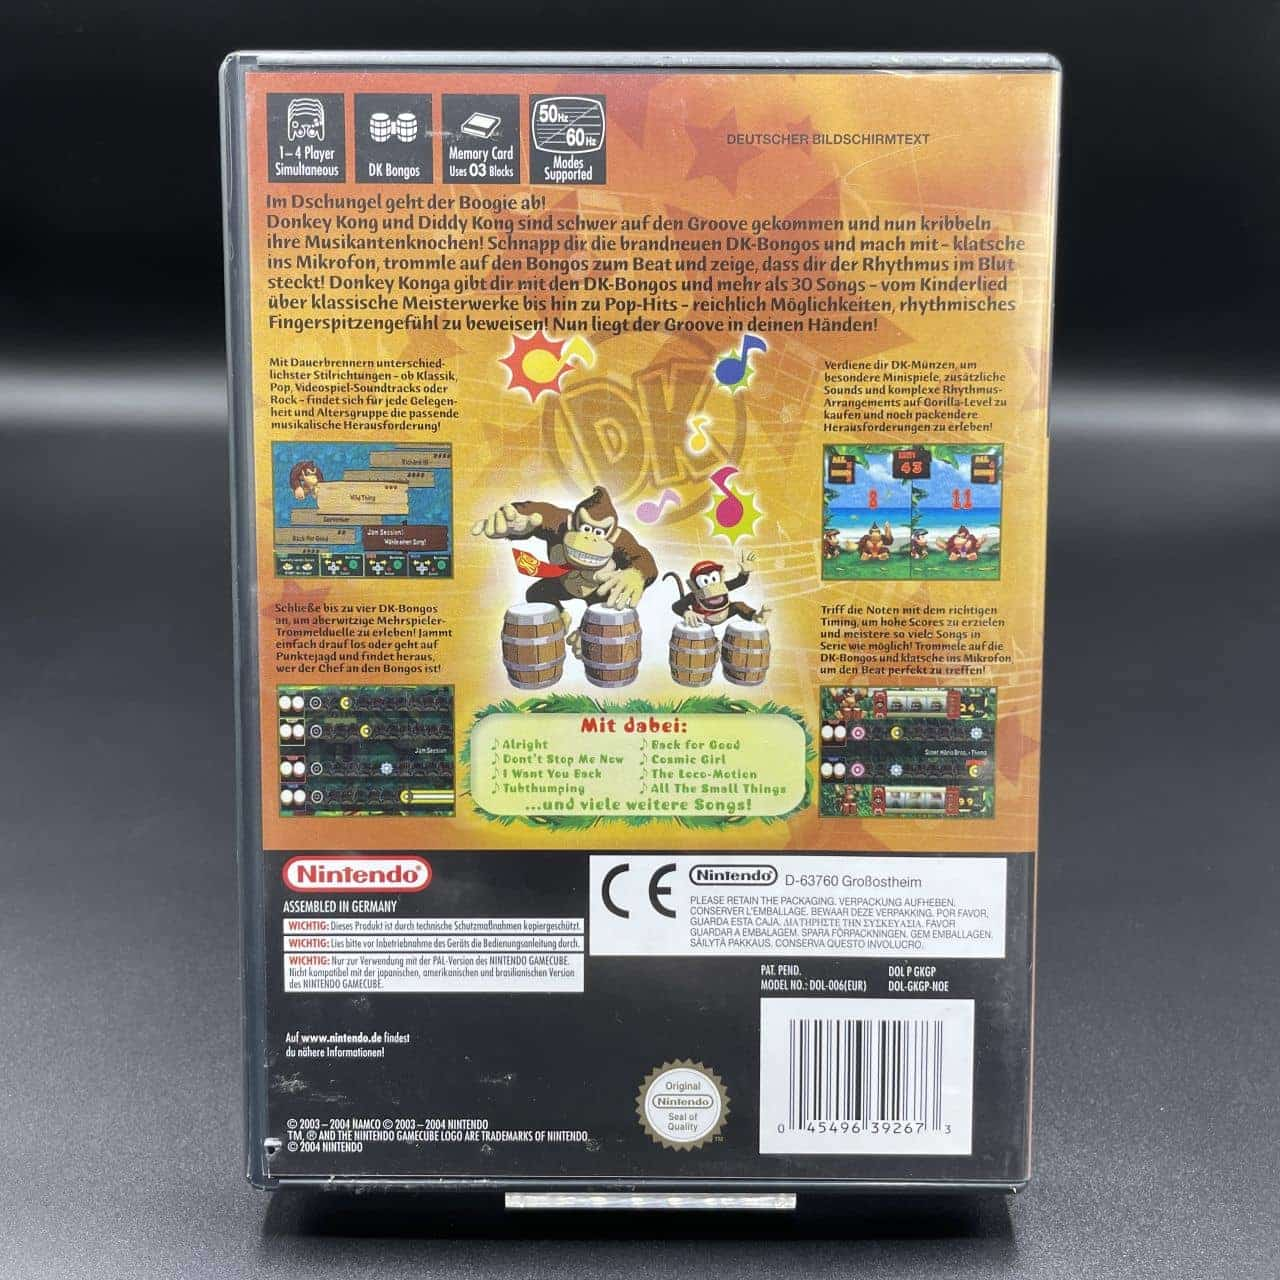 GC Donkey Konga (Komplett) (Sehr gut) Nintendo GameCube